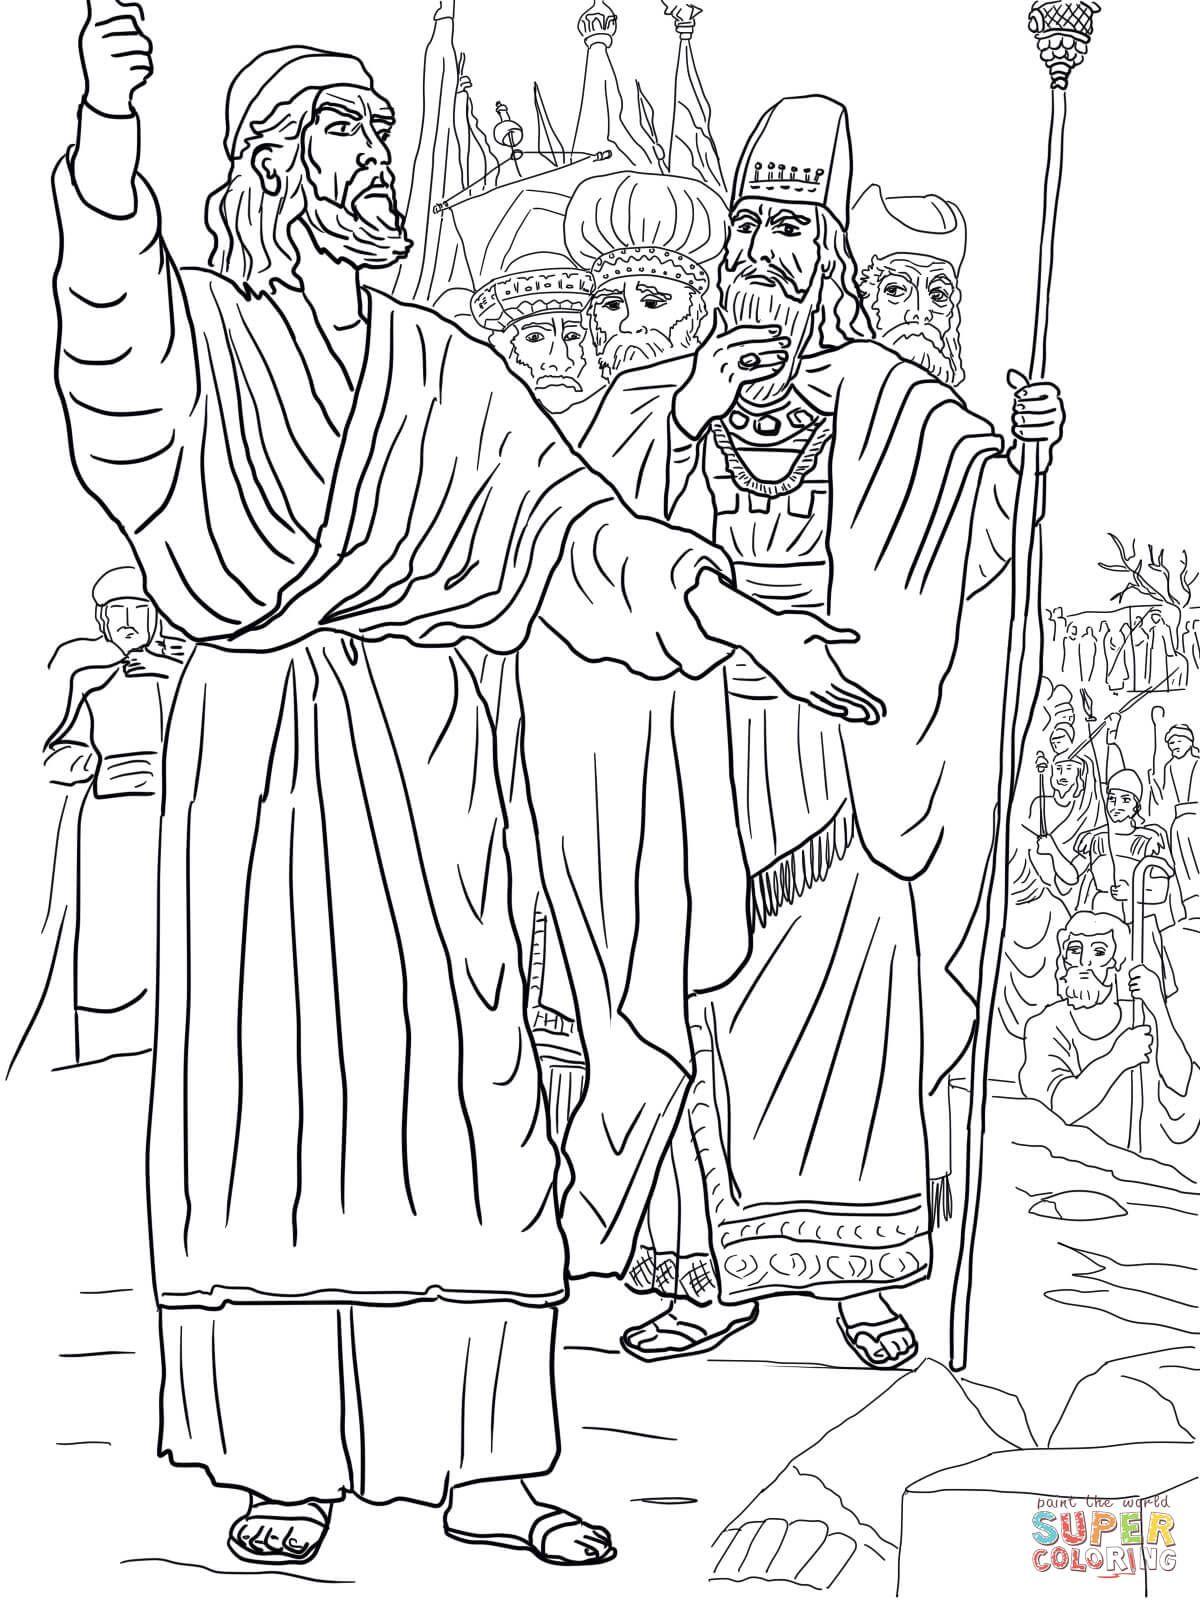 Elijah, Ahab and Prophets of Baal on Mount Carmel | Super Coloring ...